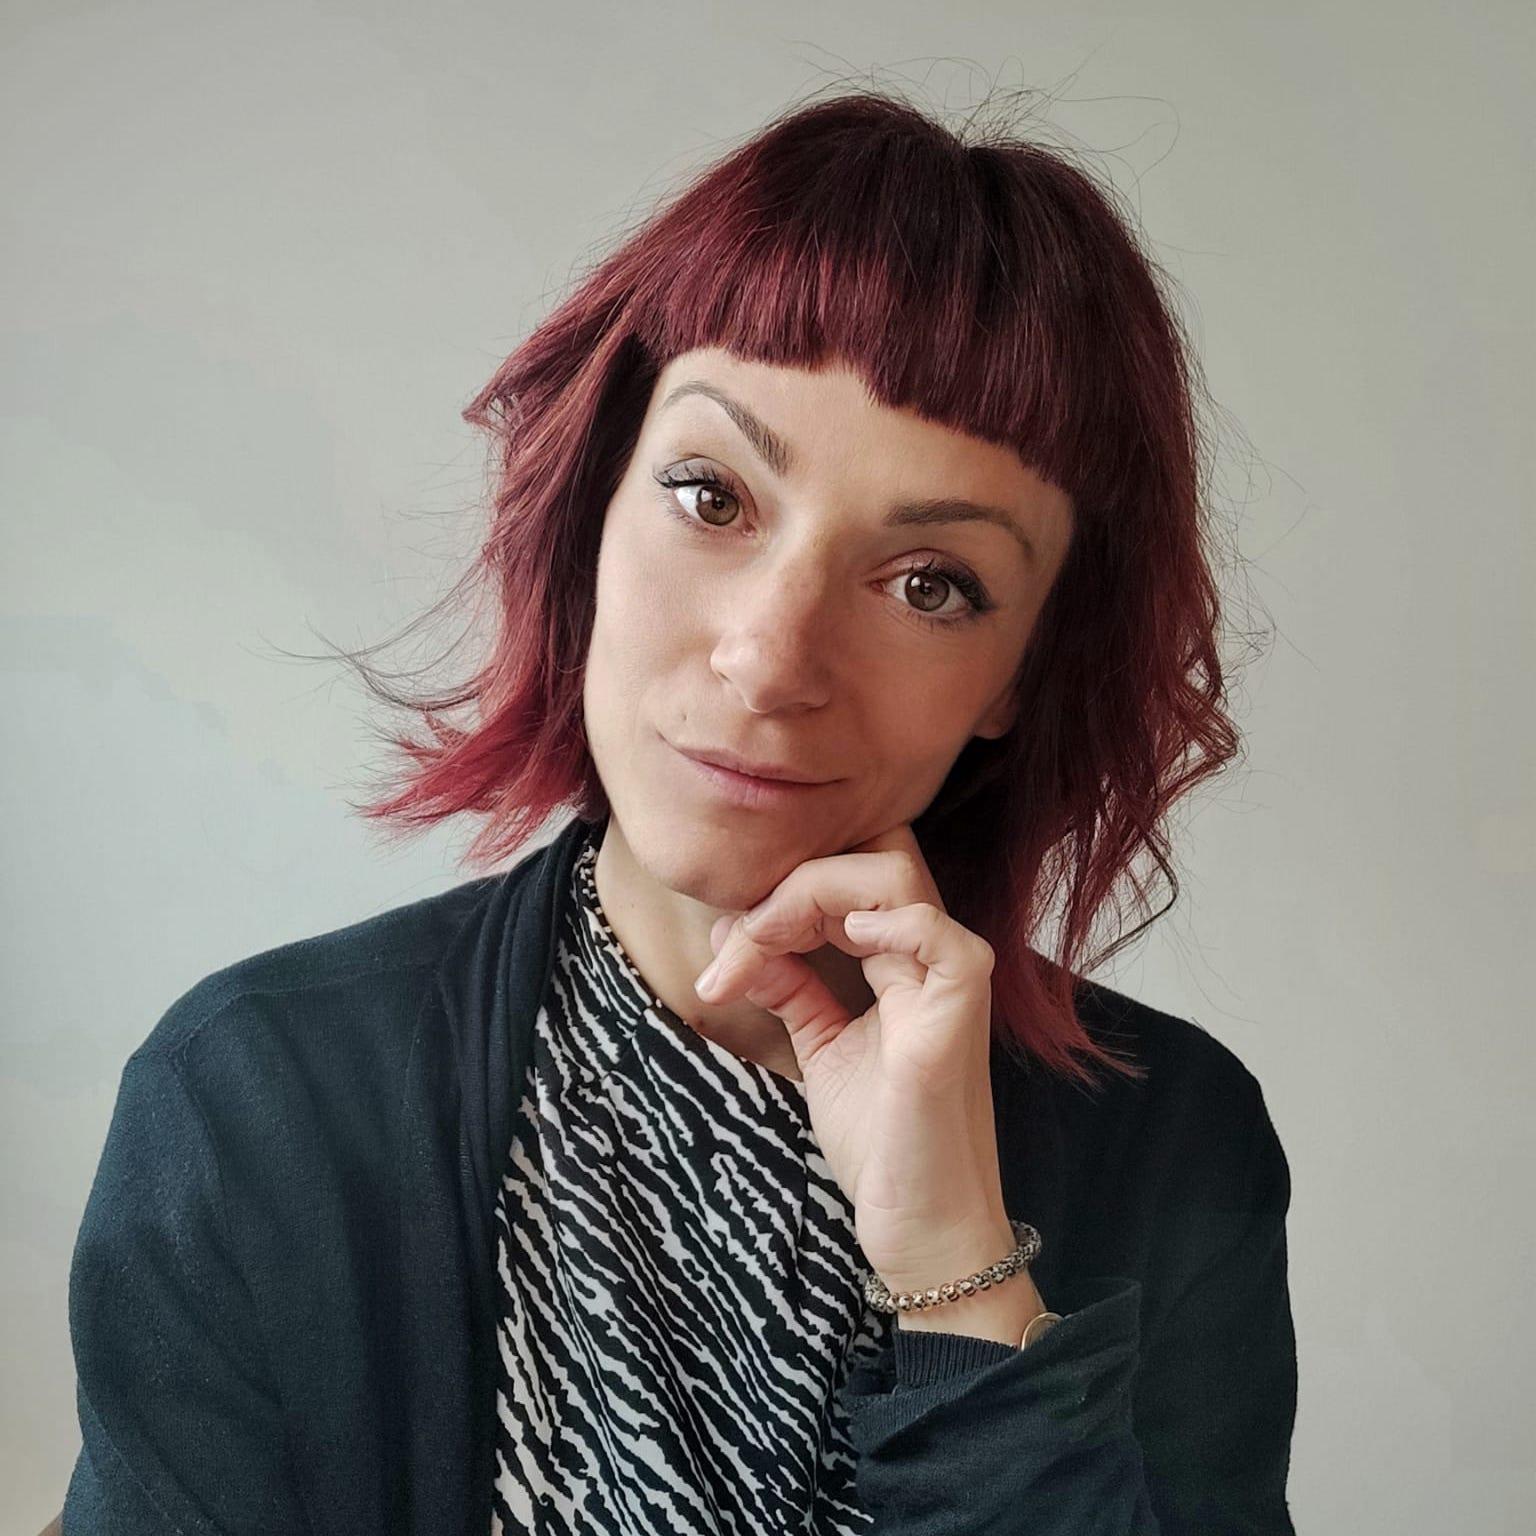 Dott.ssa Veronica Caragnini